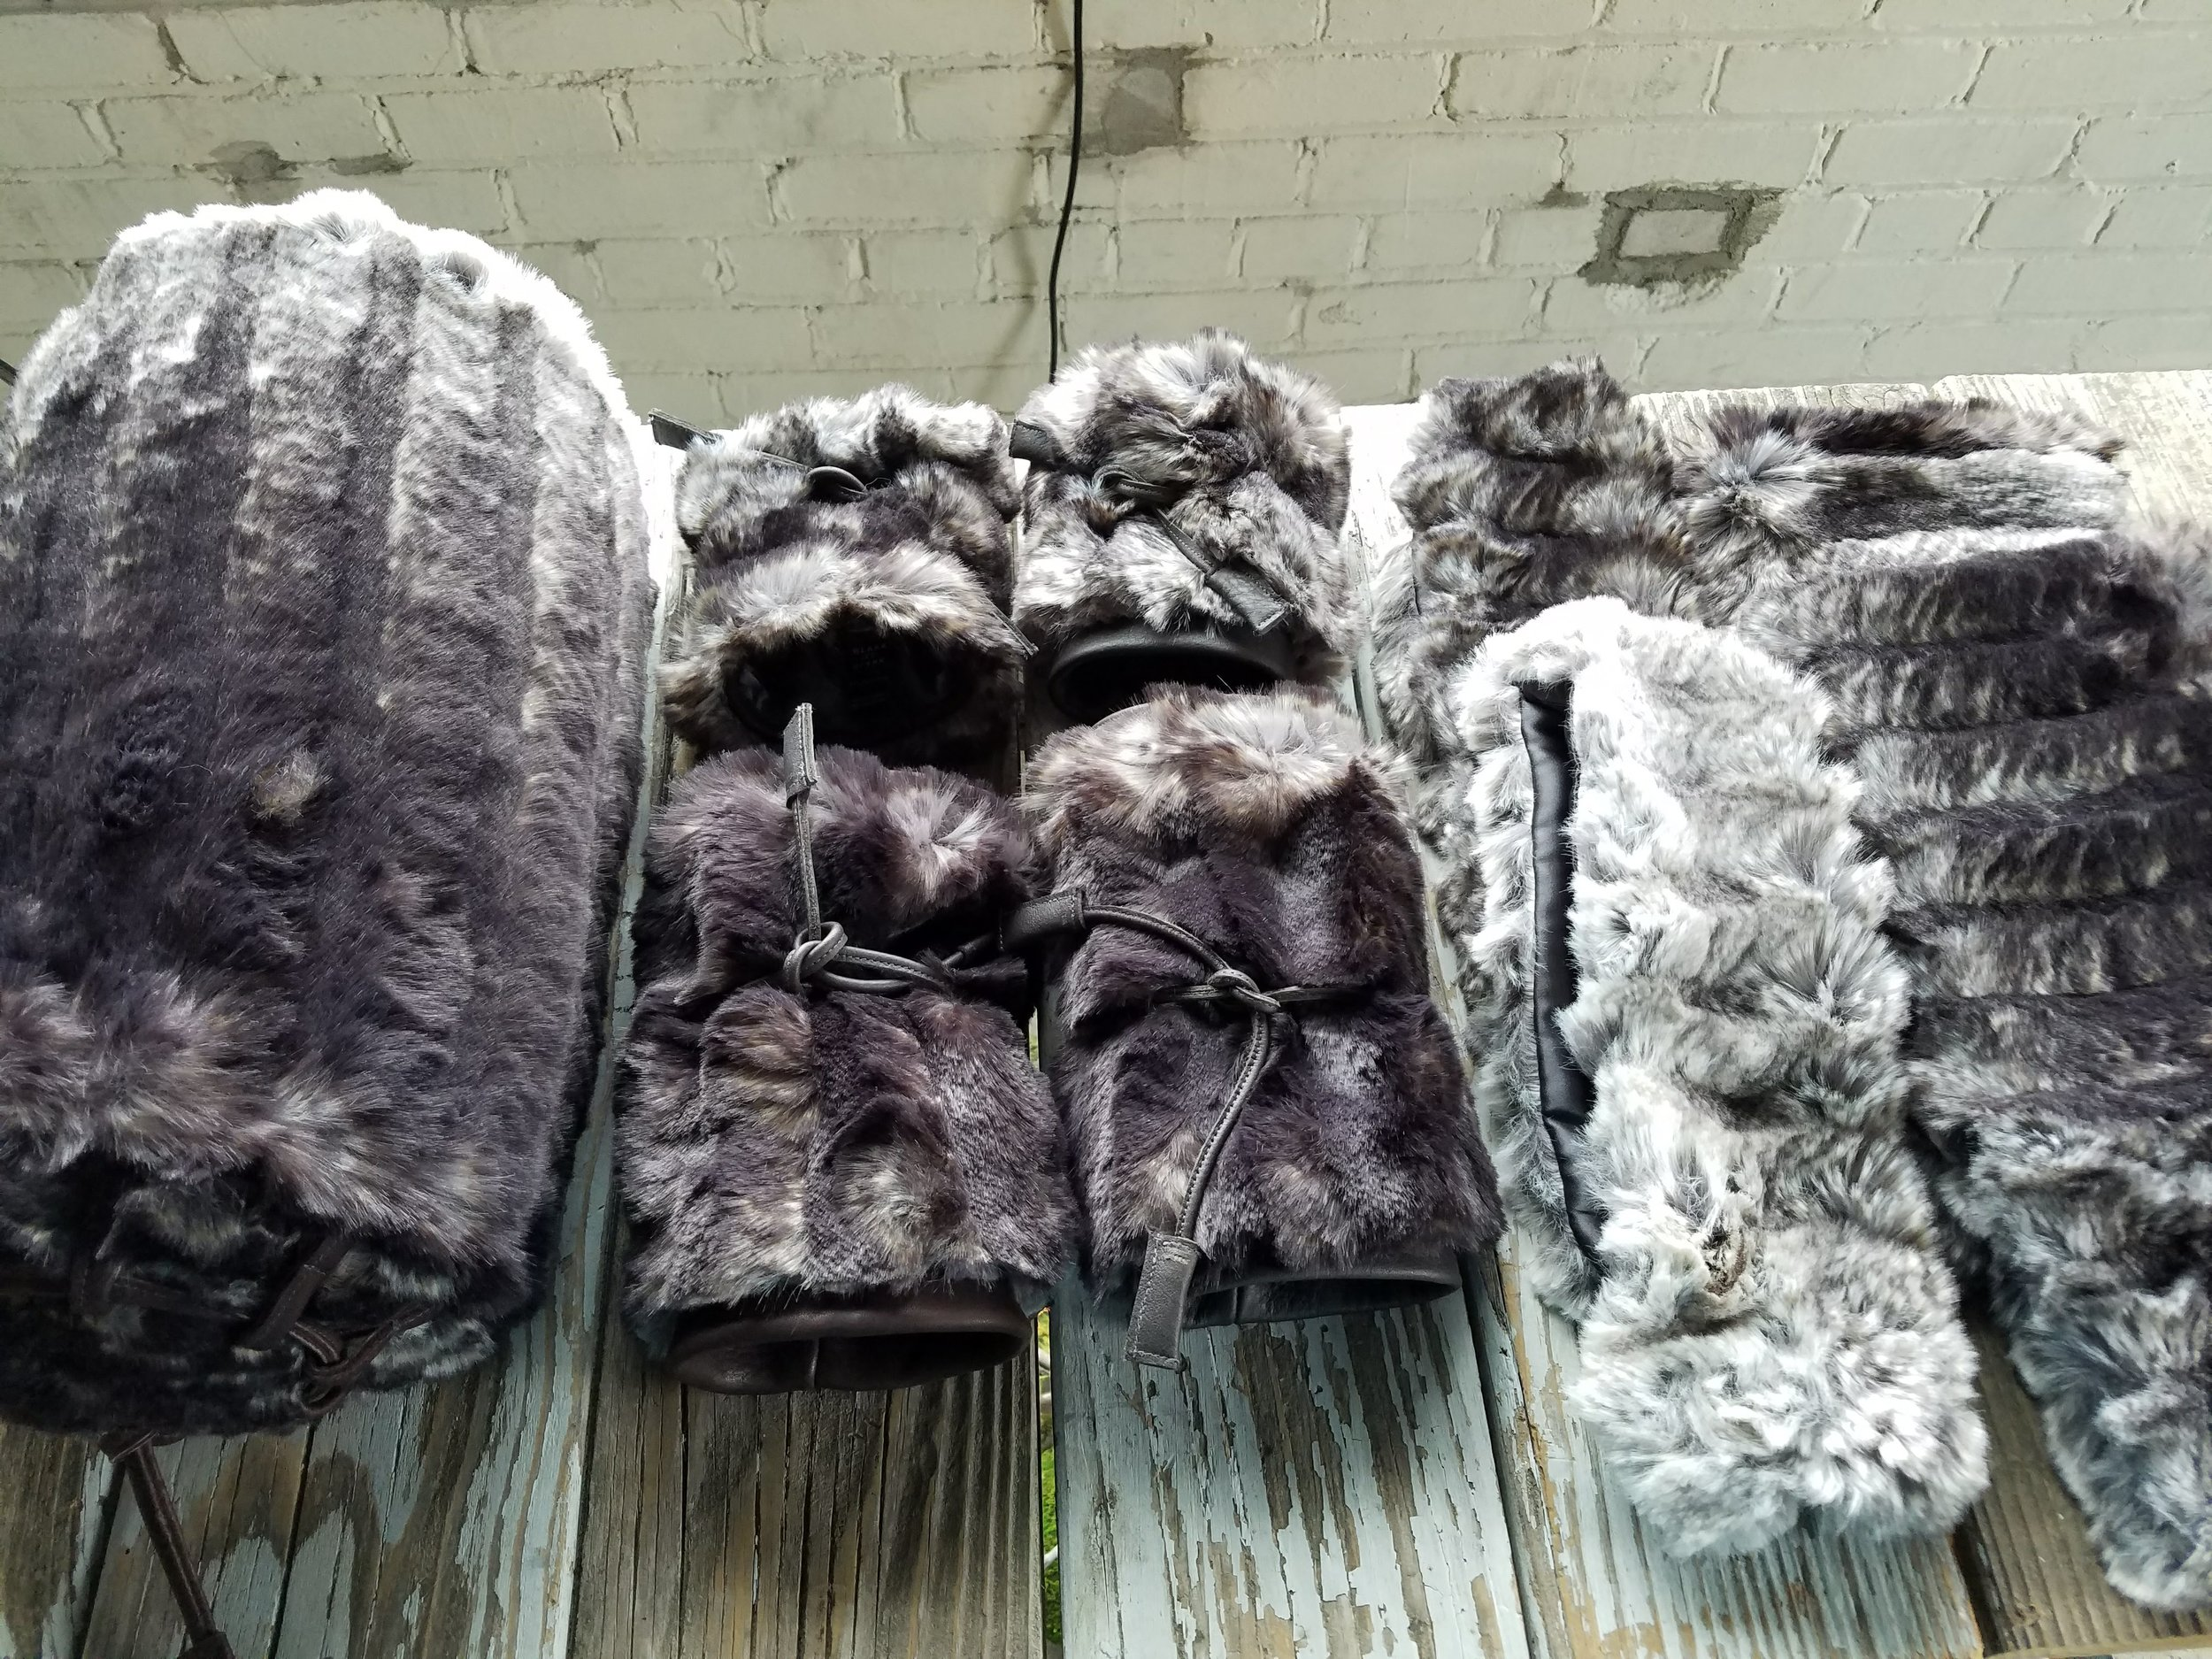 Warm and stylish looks from BLANK ITTI BLANK; pillows, fur cuffs, head wrap, muffs.